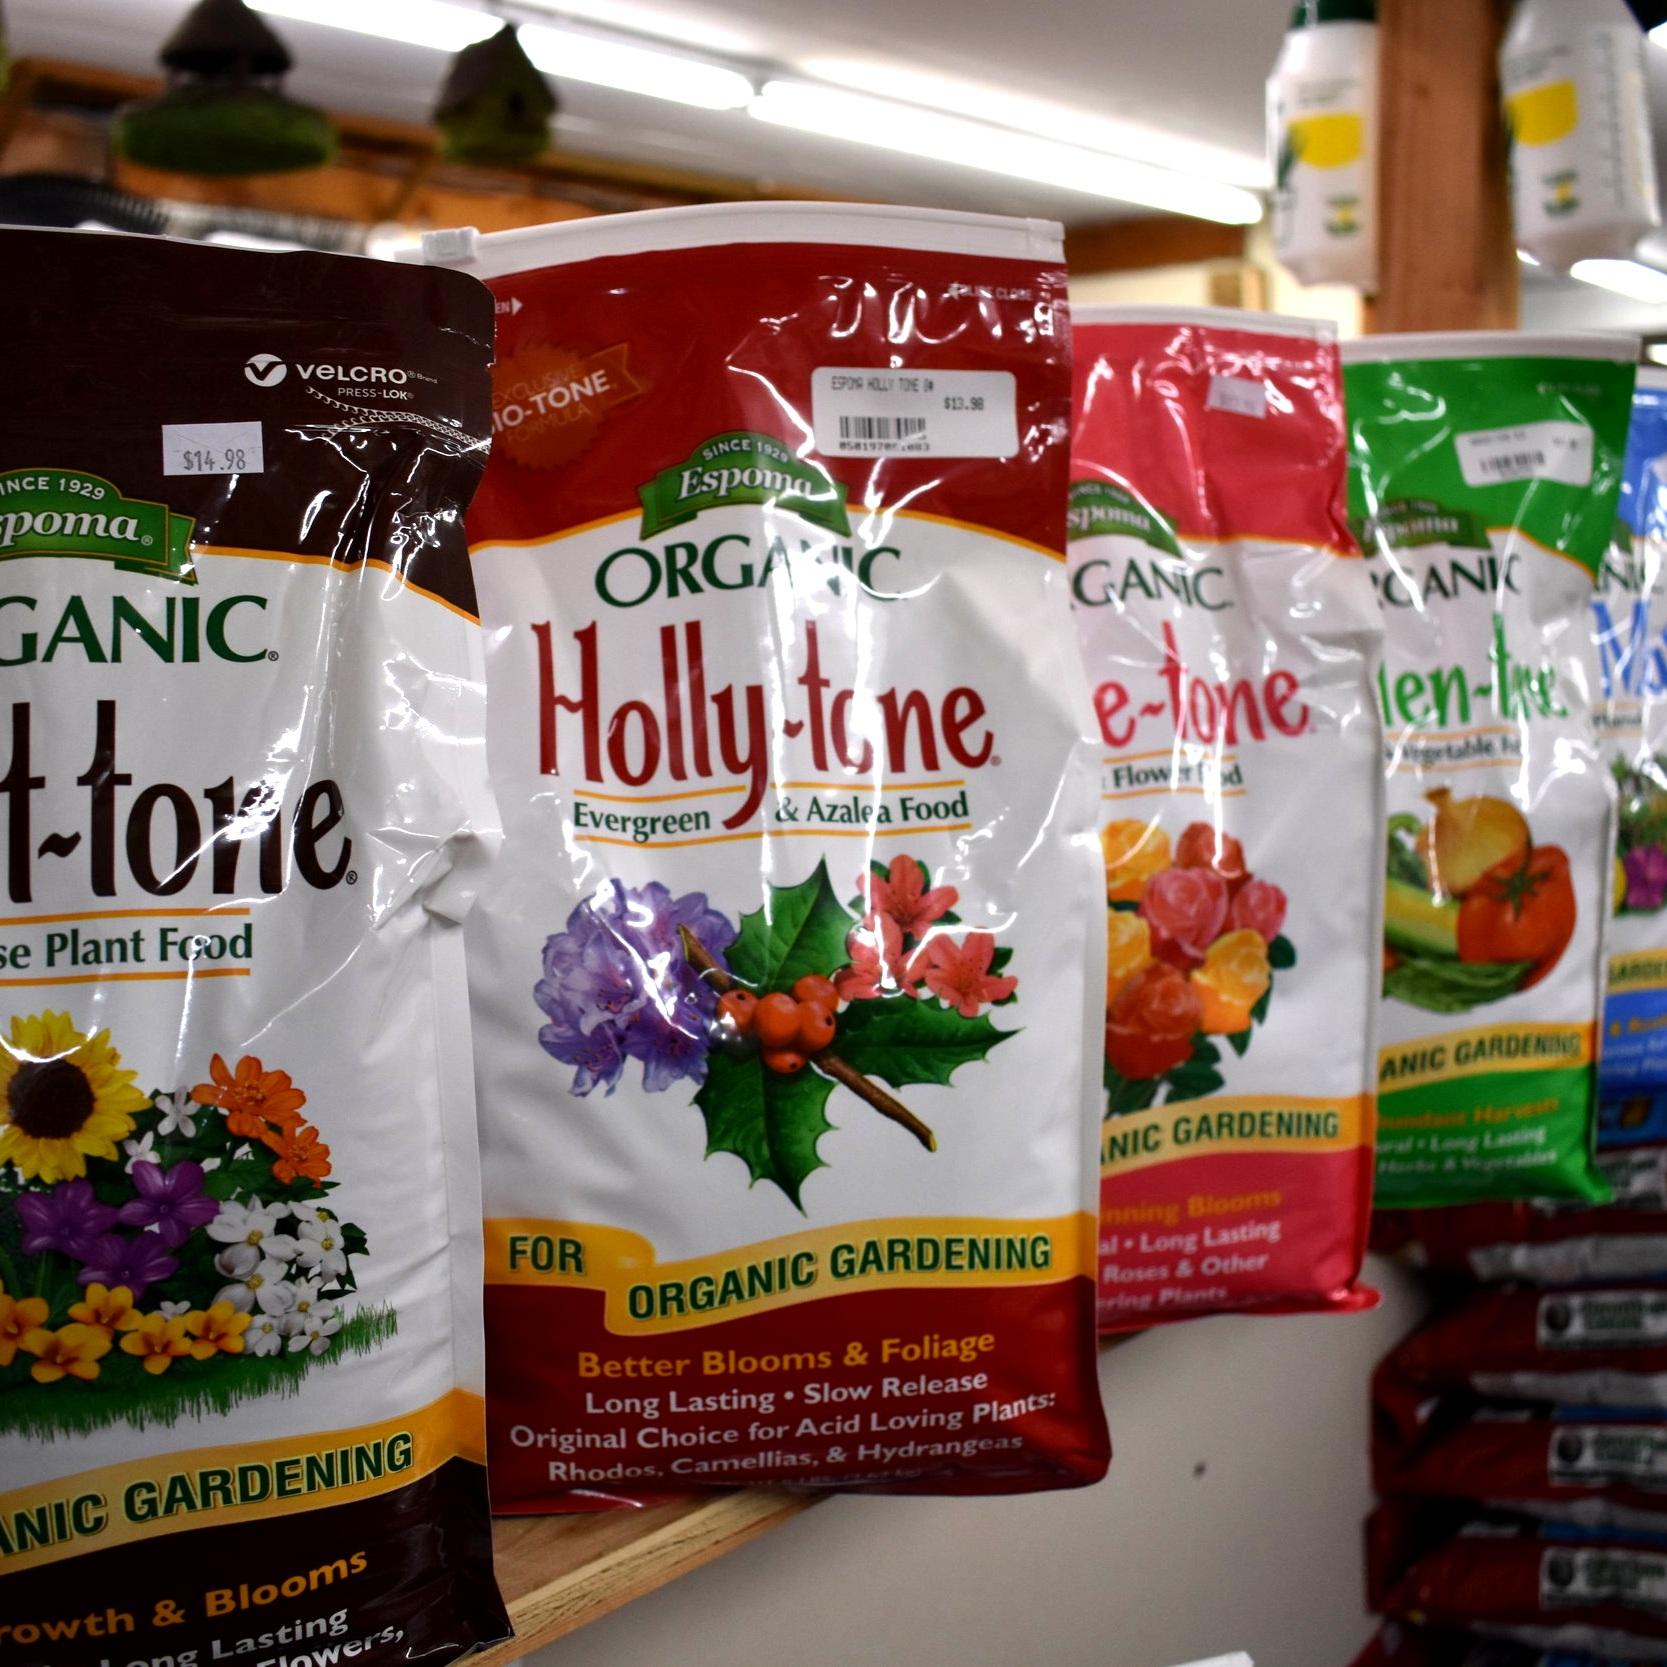 Espoma's Full Line of Organic Fertilizers